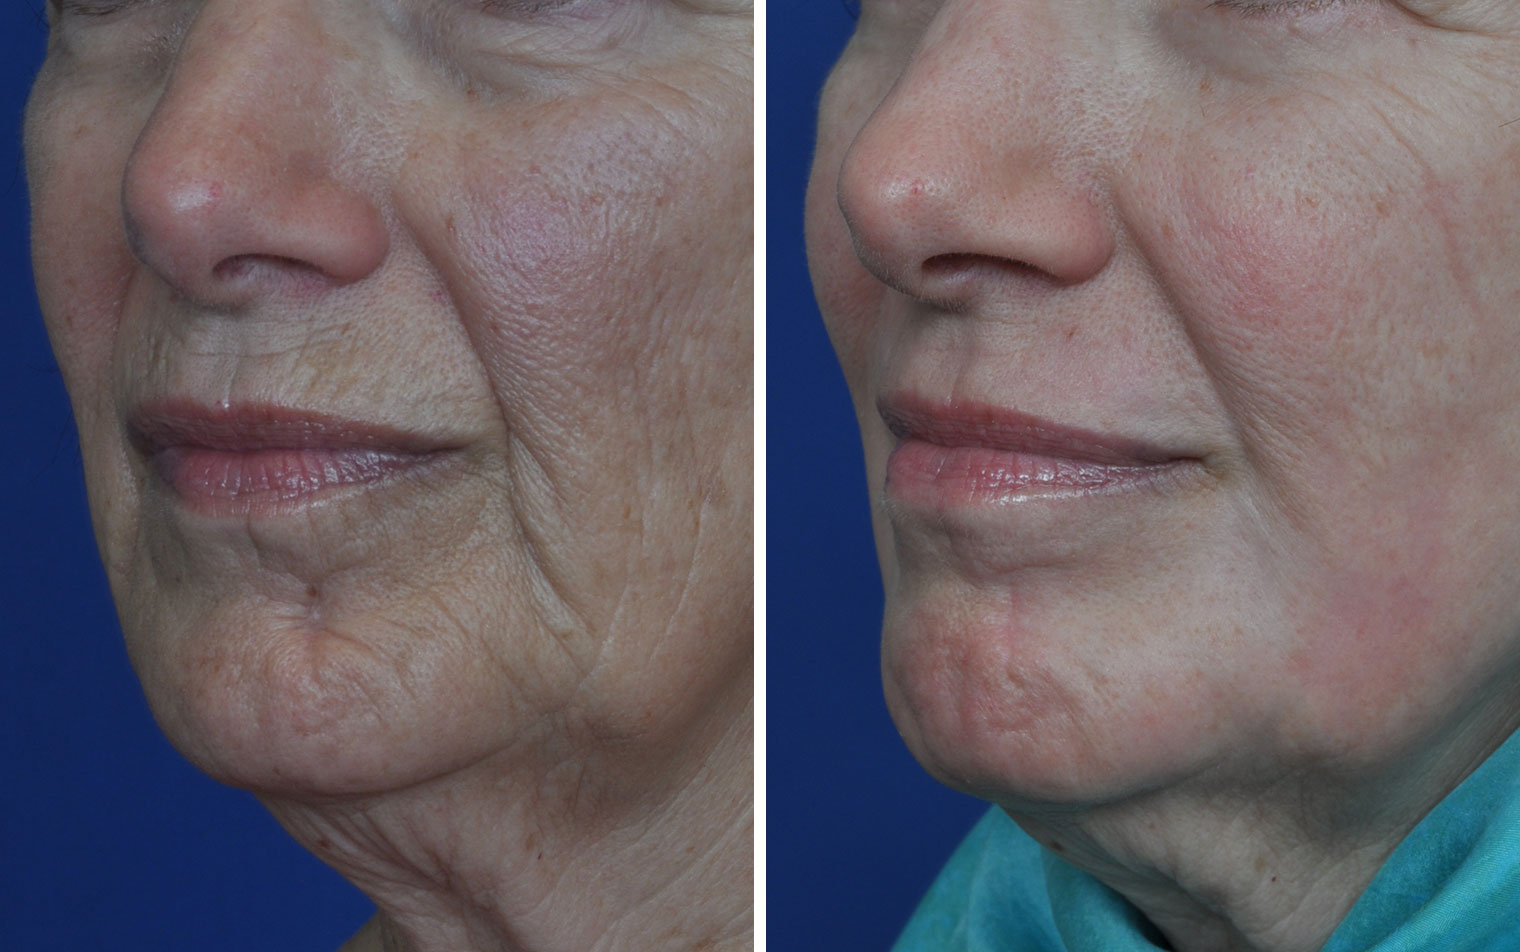 Laser facial resurfacing pictures